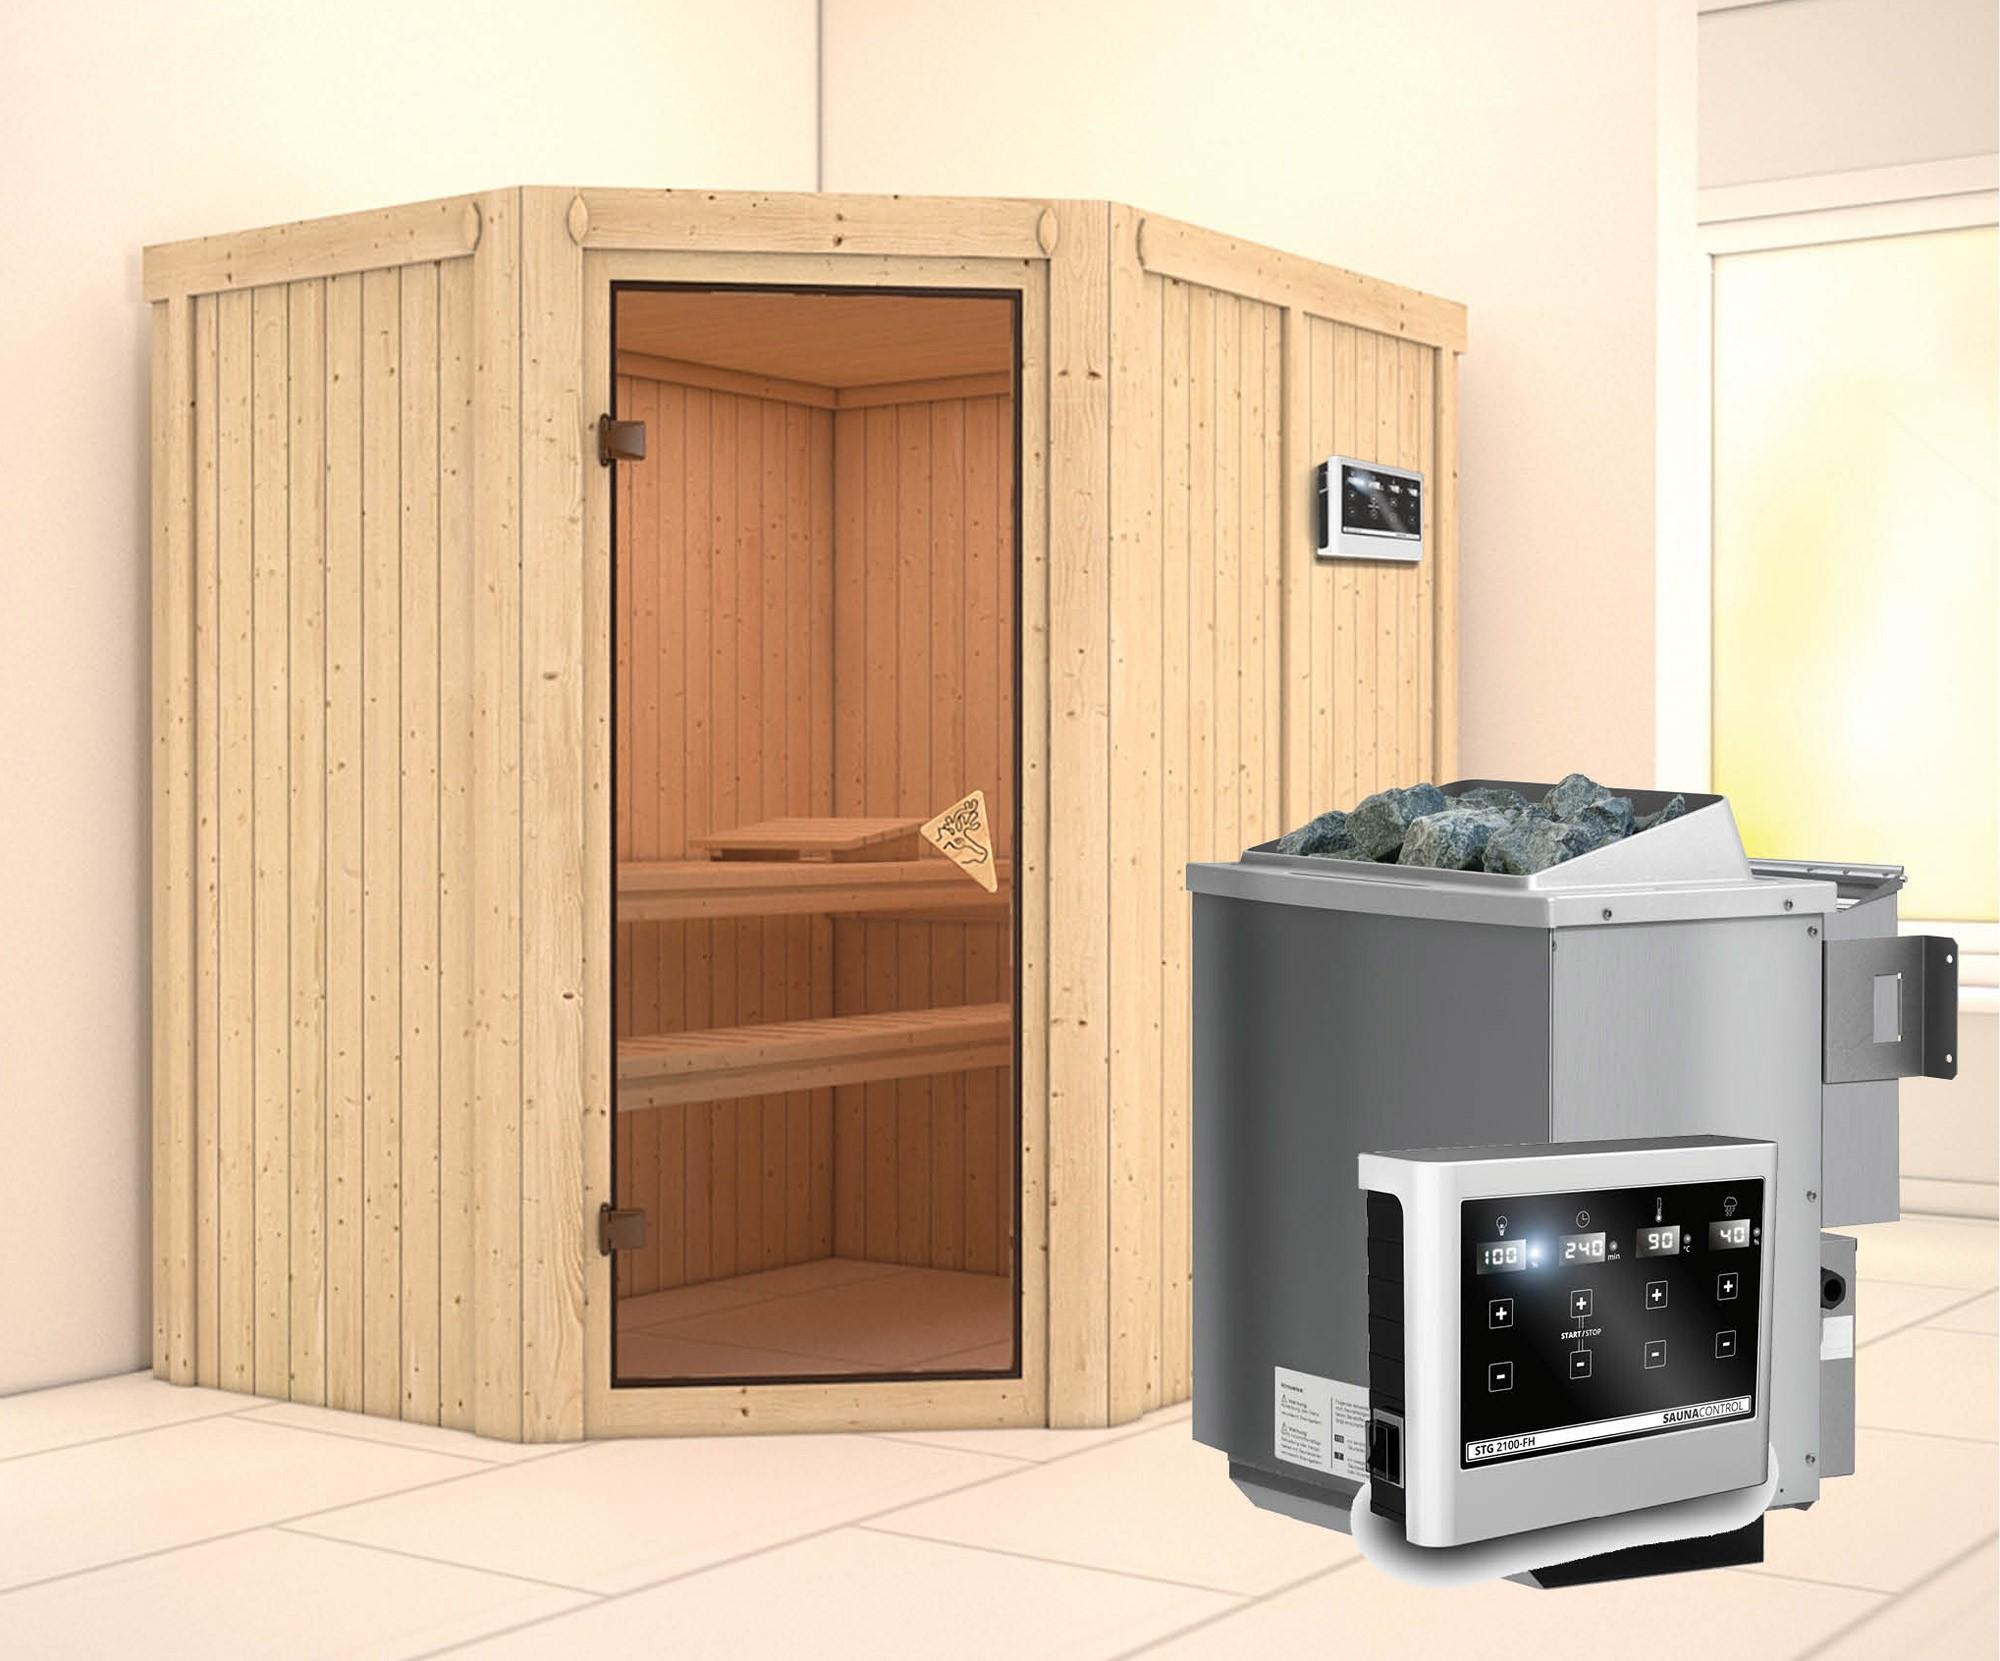 karibu sauna carin 68mm mit bio ofen 9kw classic t r bei. Black Bedroom Furniture Sets. Home Design Ideas